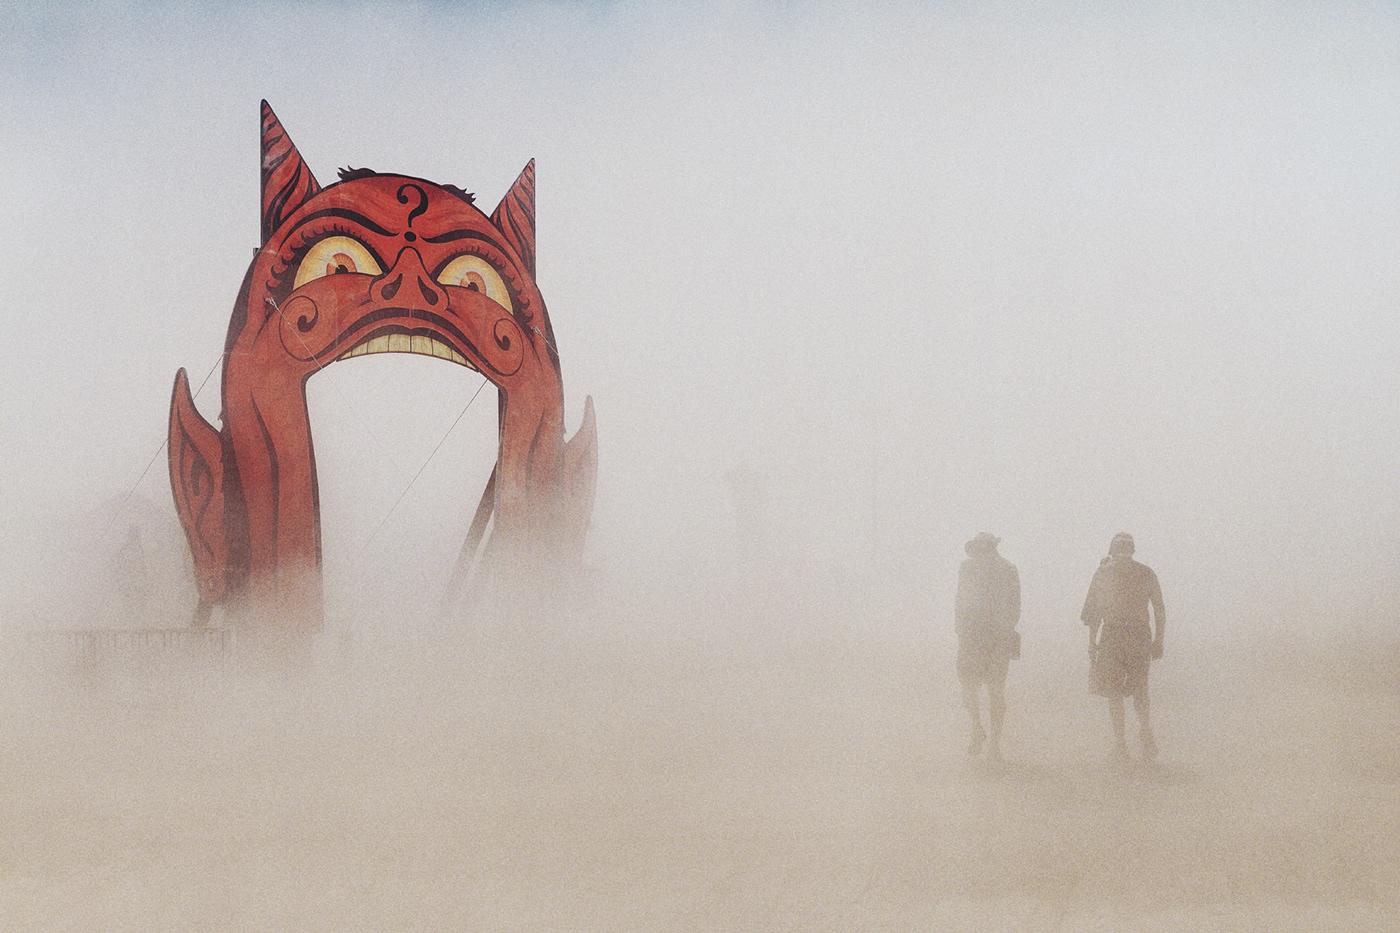 Burning Man photo sculpture art Exhibition  man fire outside